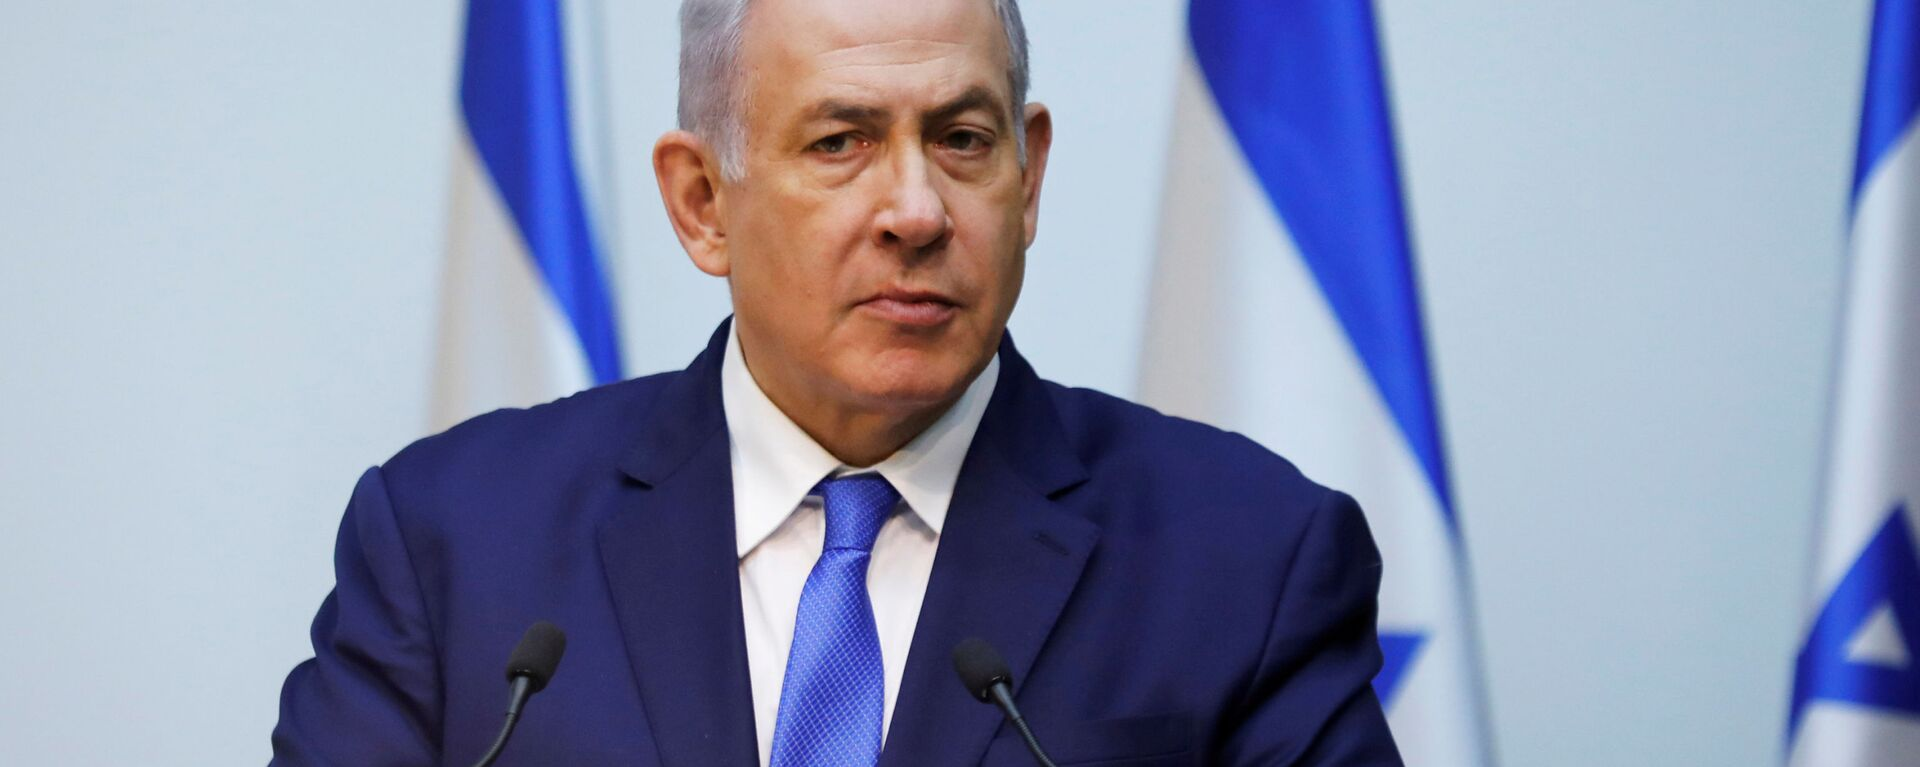 Il primo ministro di Israele Benjamin Netanyahu  - Sputnik Italia, 1920, 02.01.2020